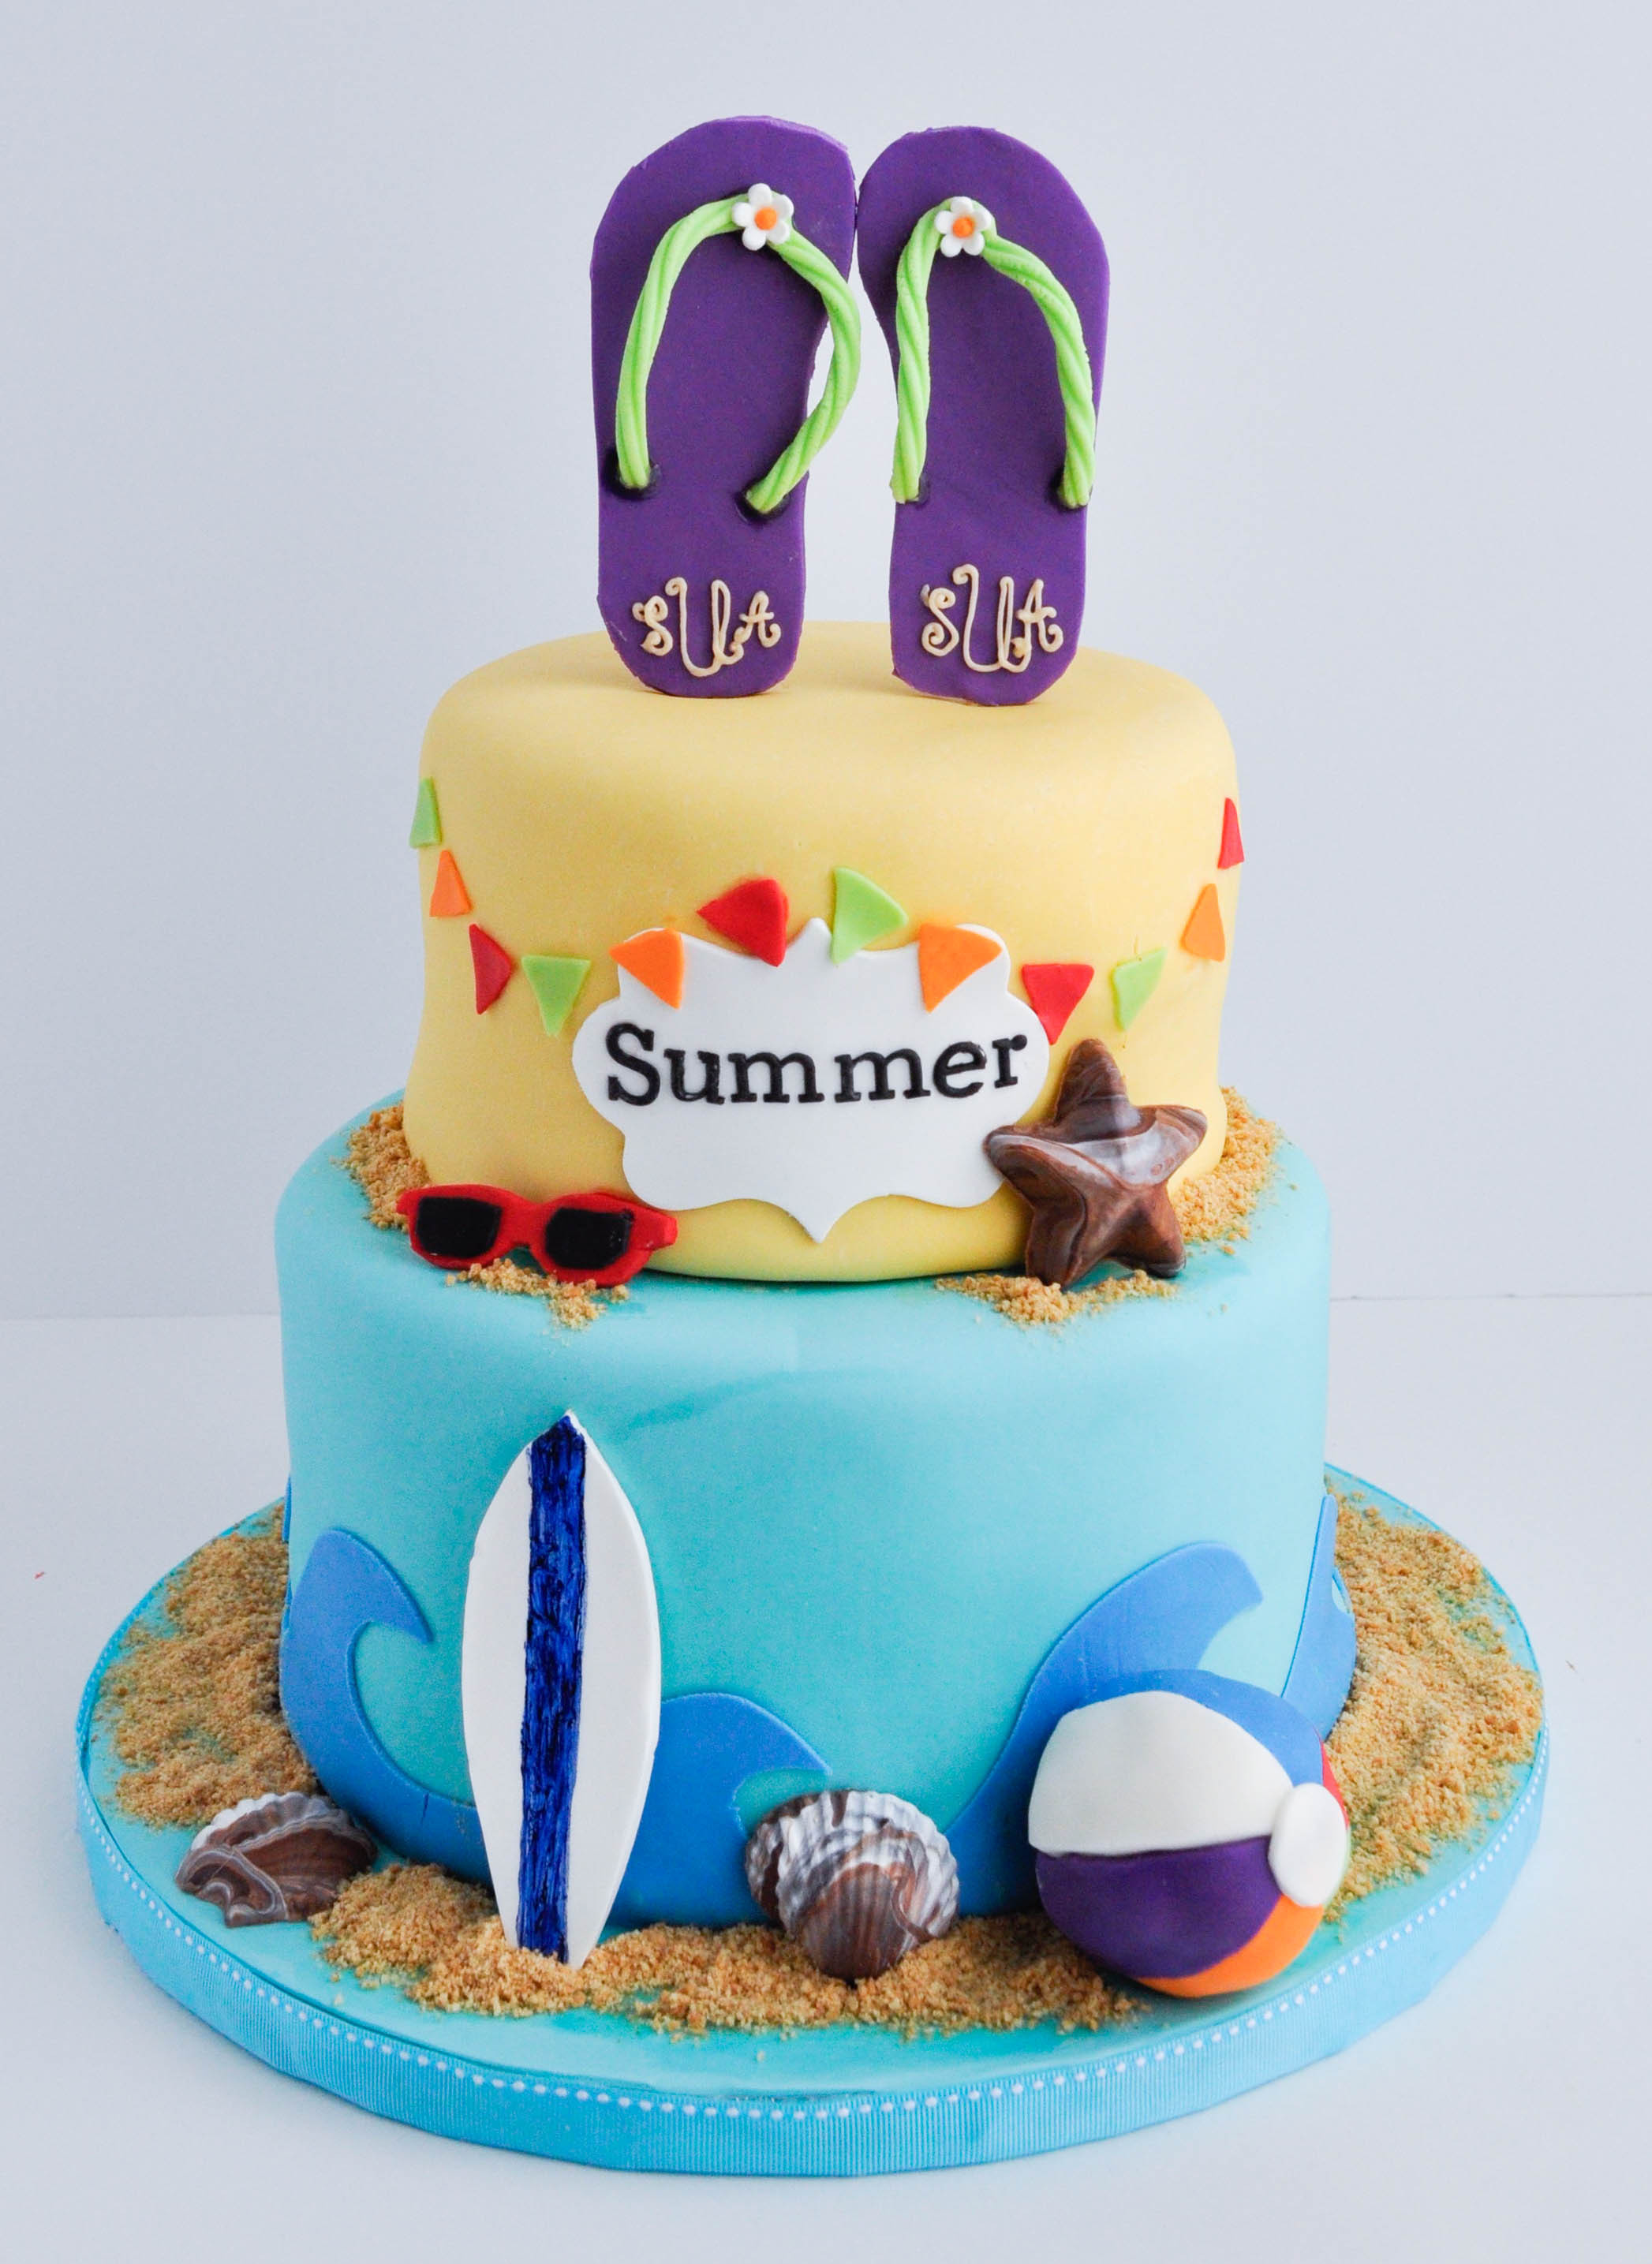 Summer Birthday Cake Ideas  Summer Swiming Cake